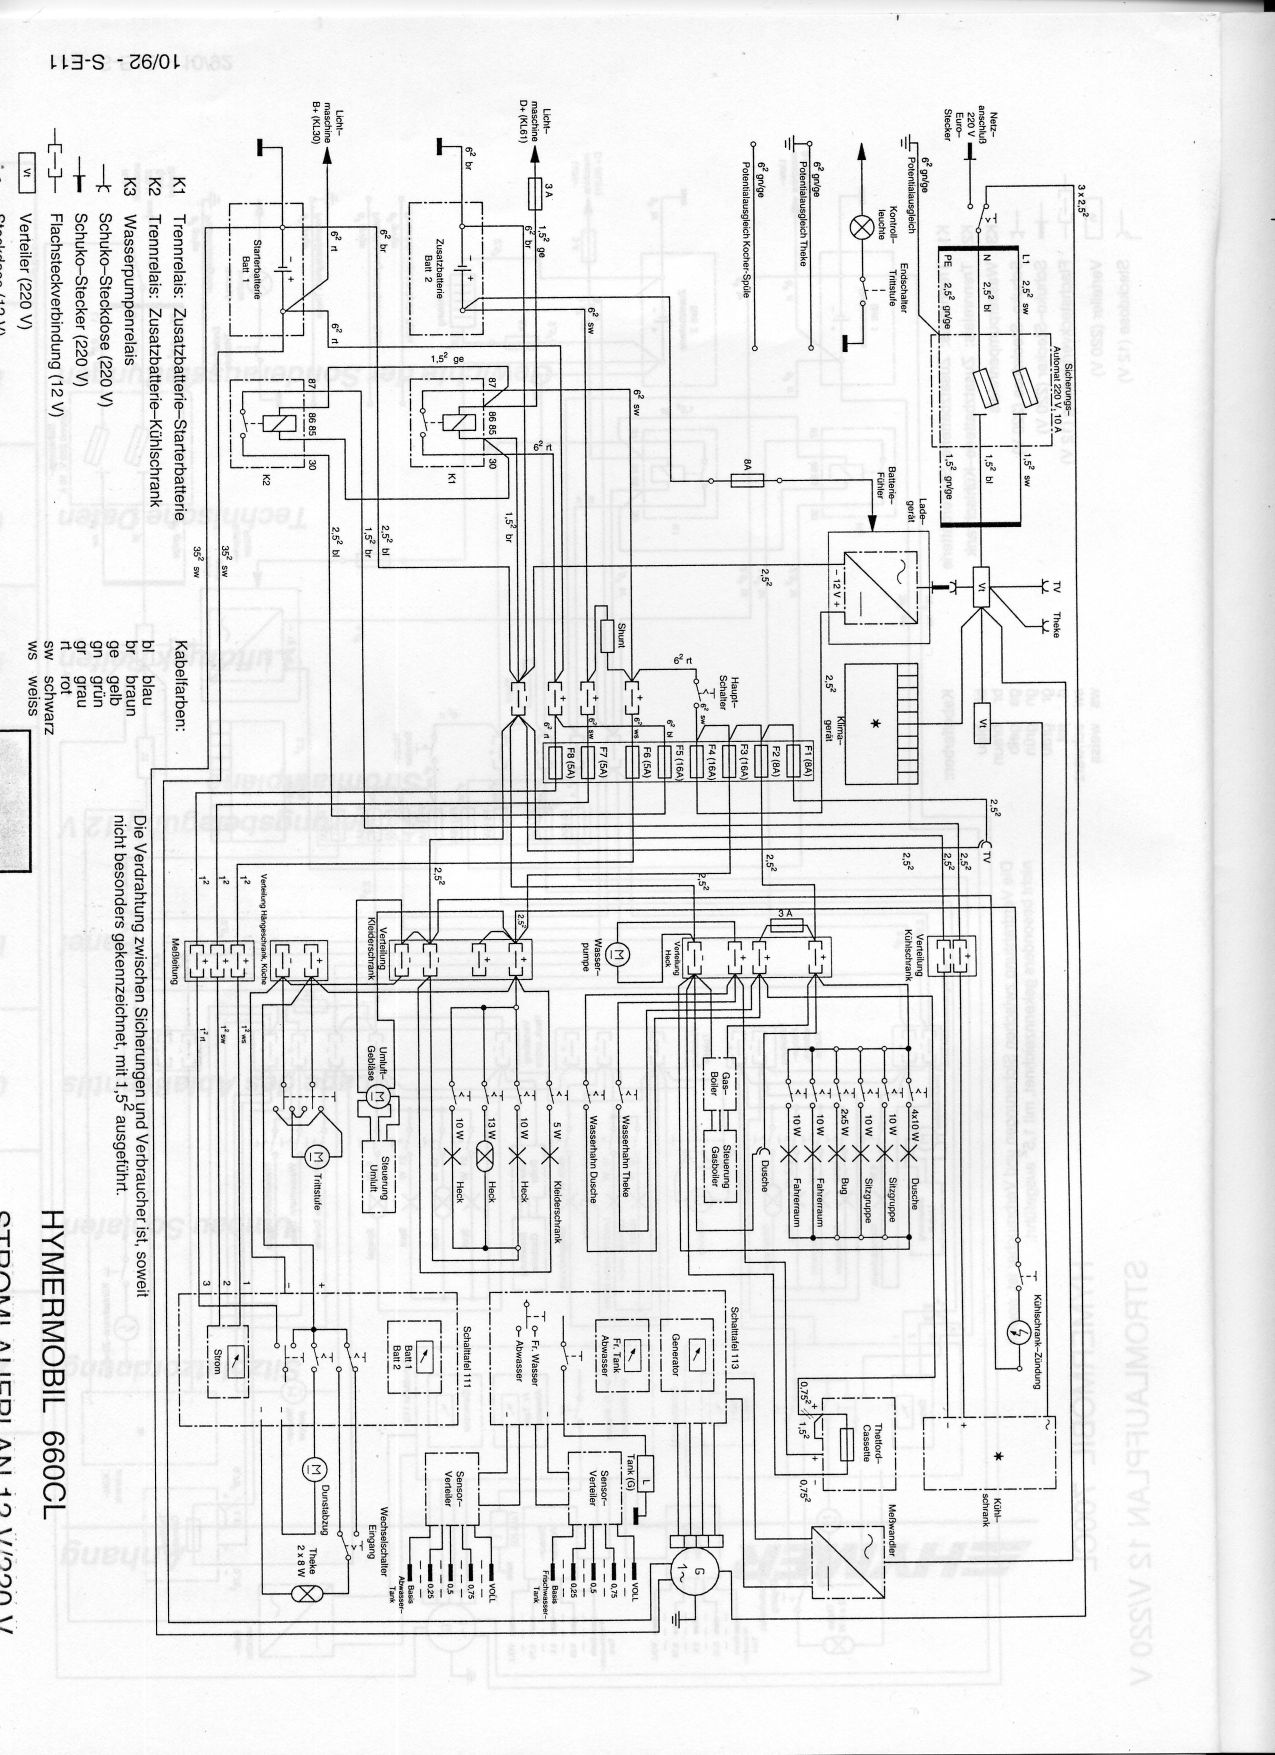 Wechselrichter S660 Bj 91 - HME Reisemobil-Forum